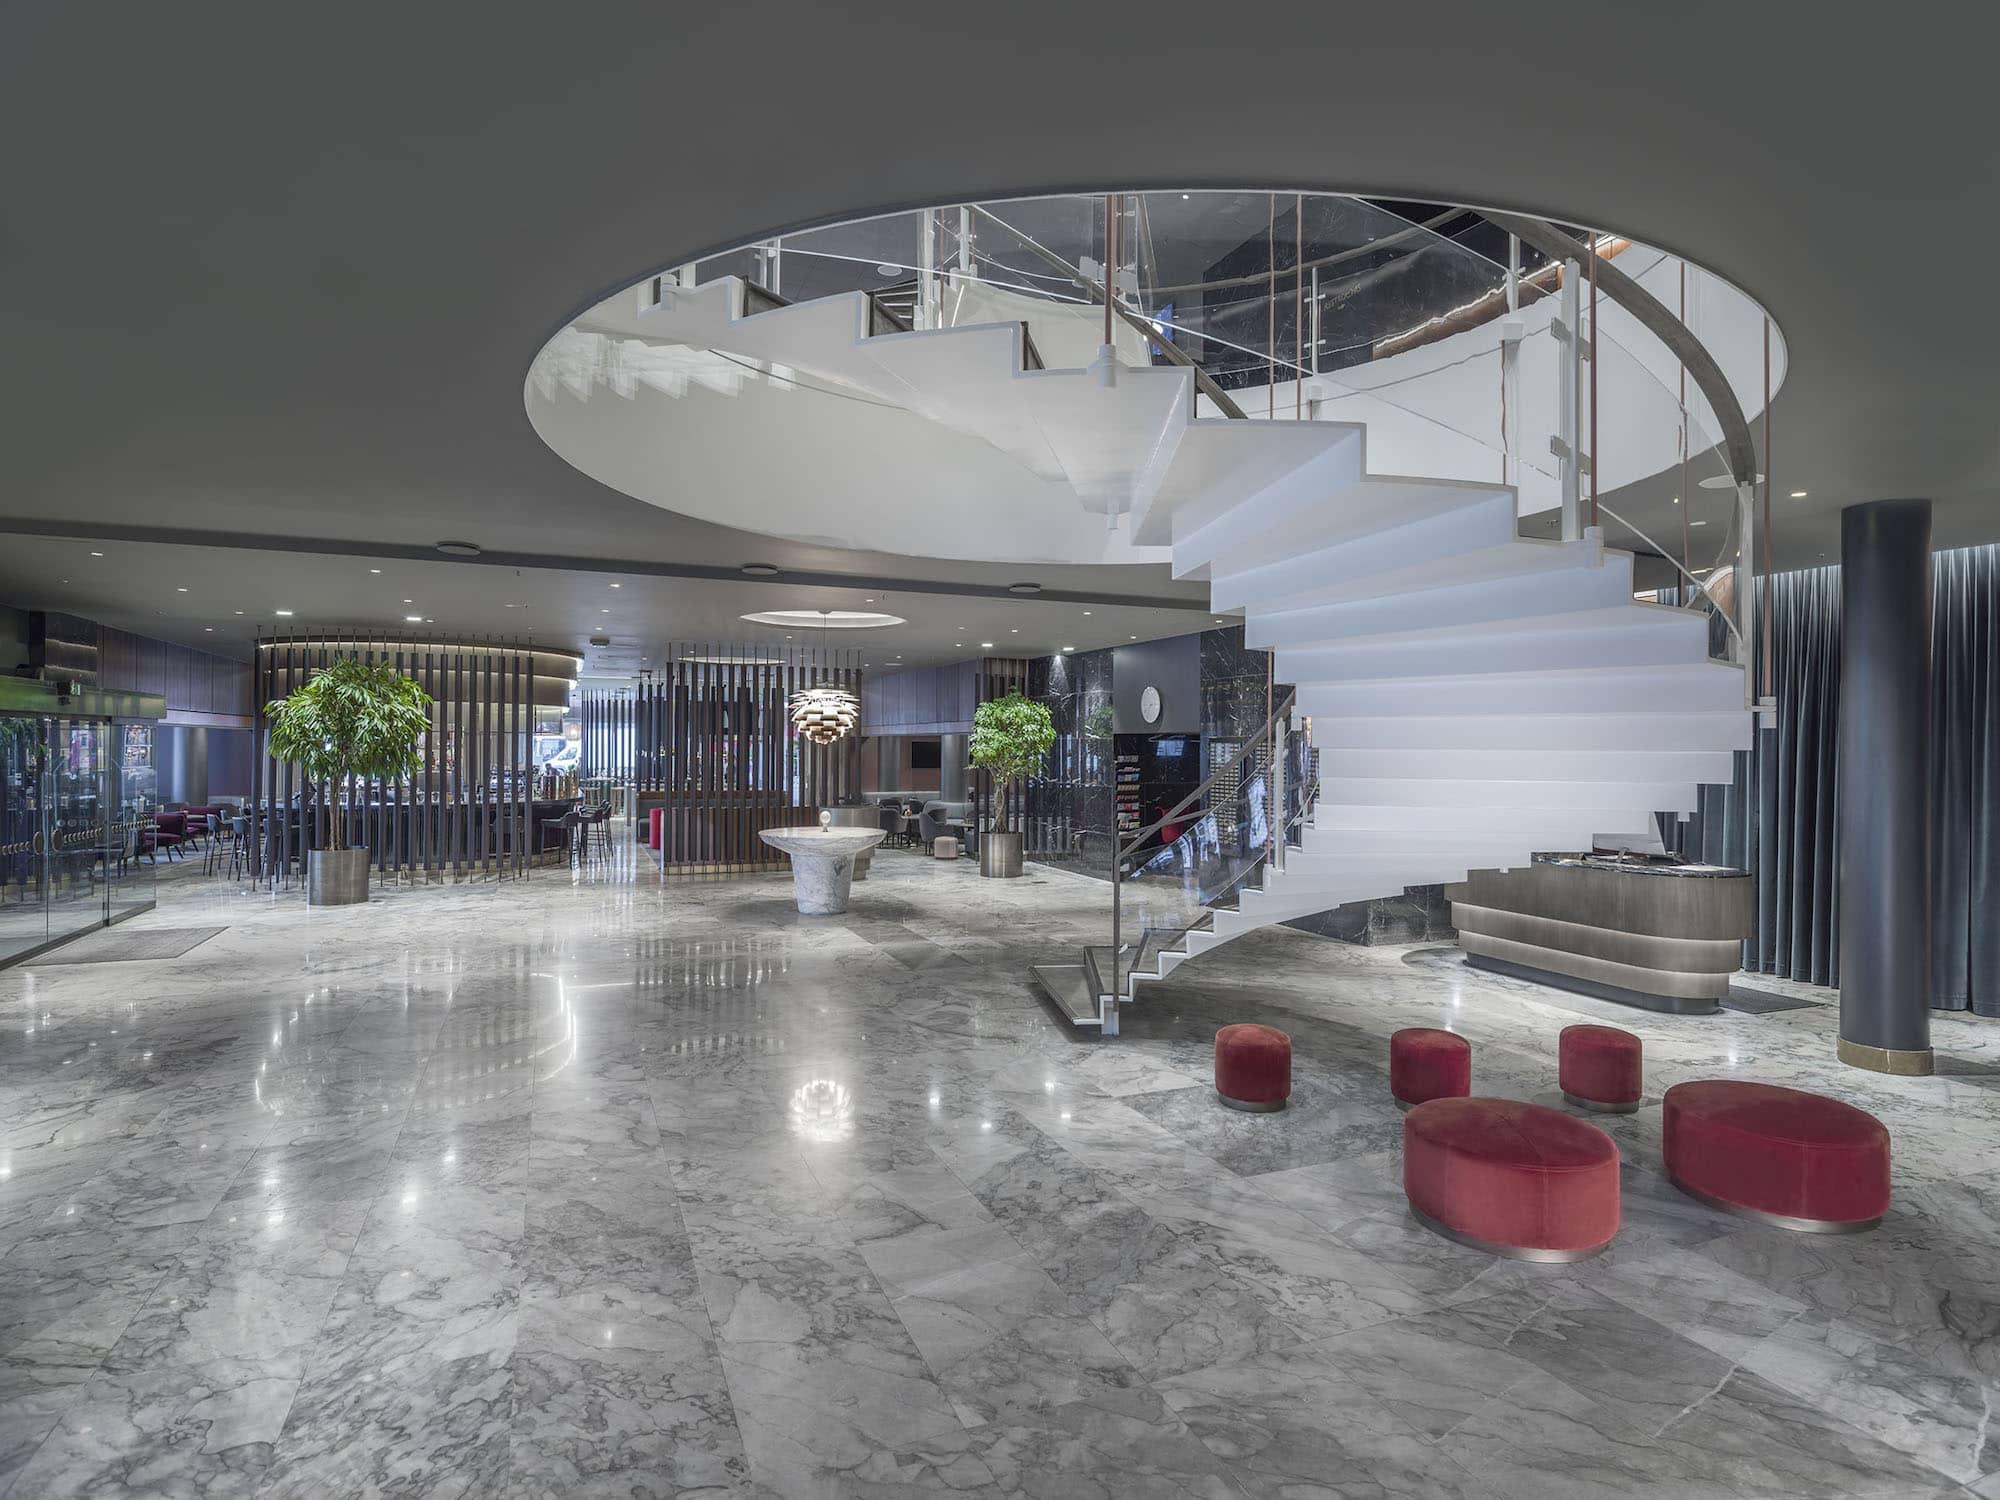 The lobby of the Radisson Blu Royal Hotel in Copenhagen designed by Arne Jacobsen